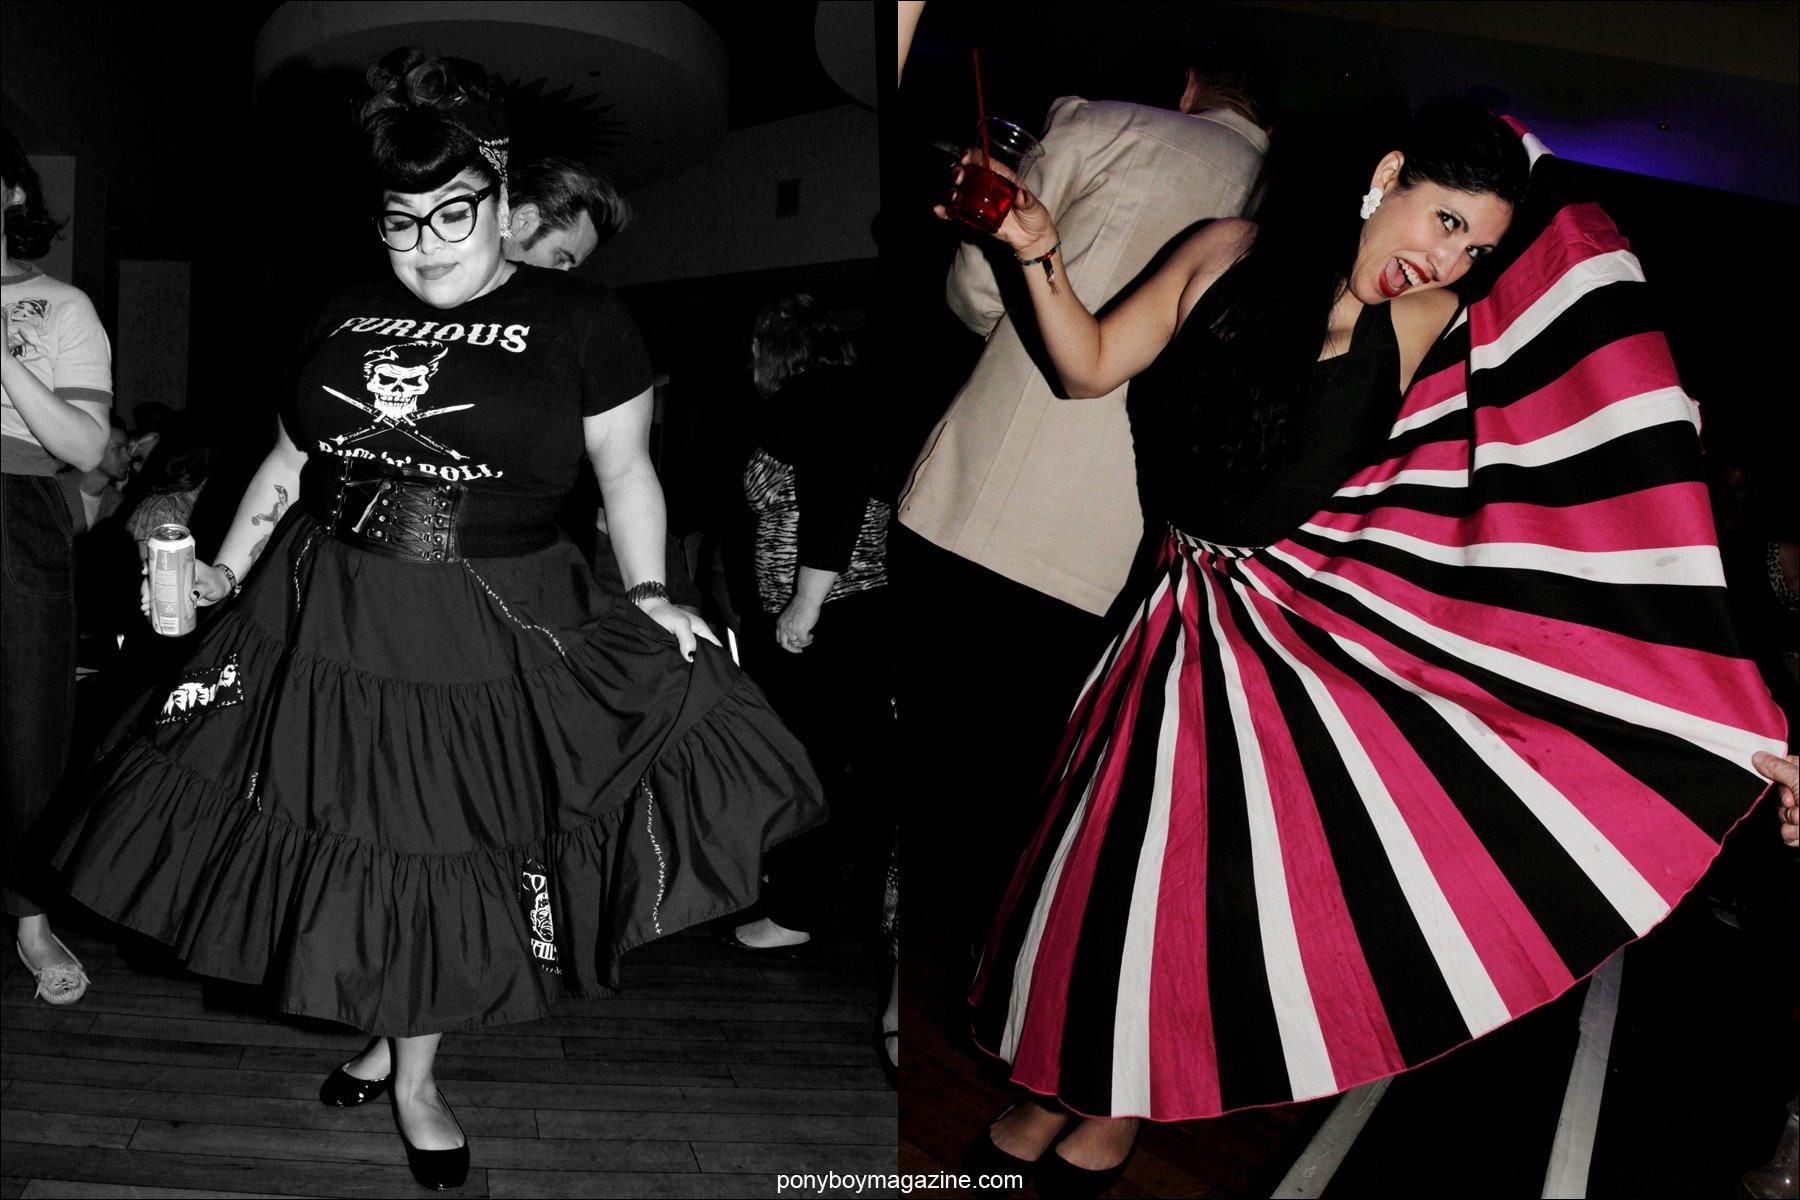 Women in full skirted 1950's fashions, photographed on the dance floor at Tom Ingram's rockabilly weekender Viva Las Vegas. Images by Ponyboy Magazine photographer Alexander Thompson.